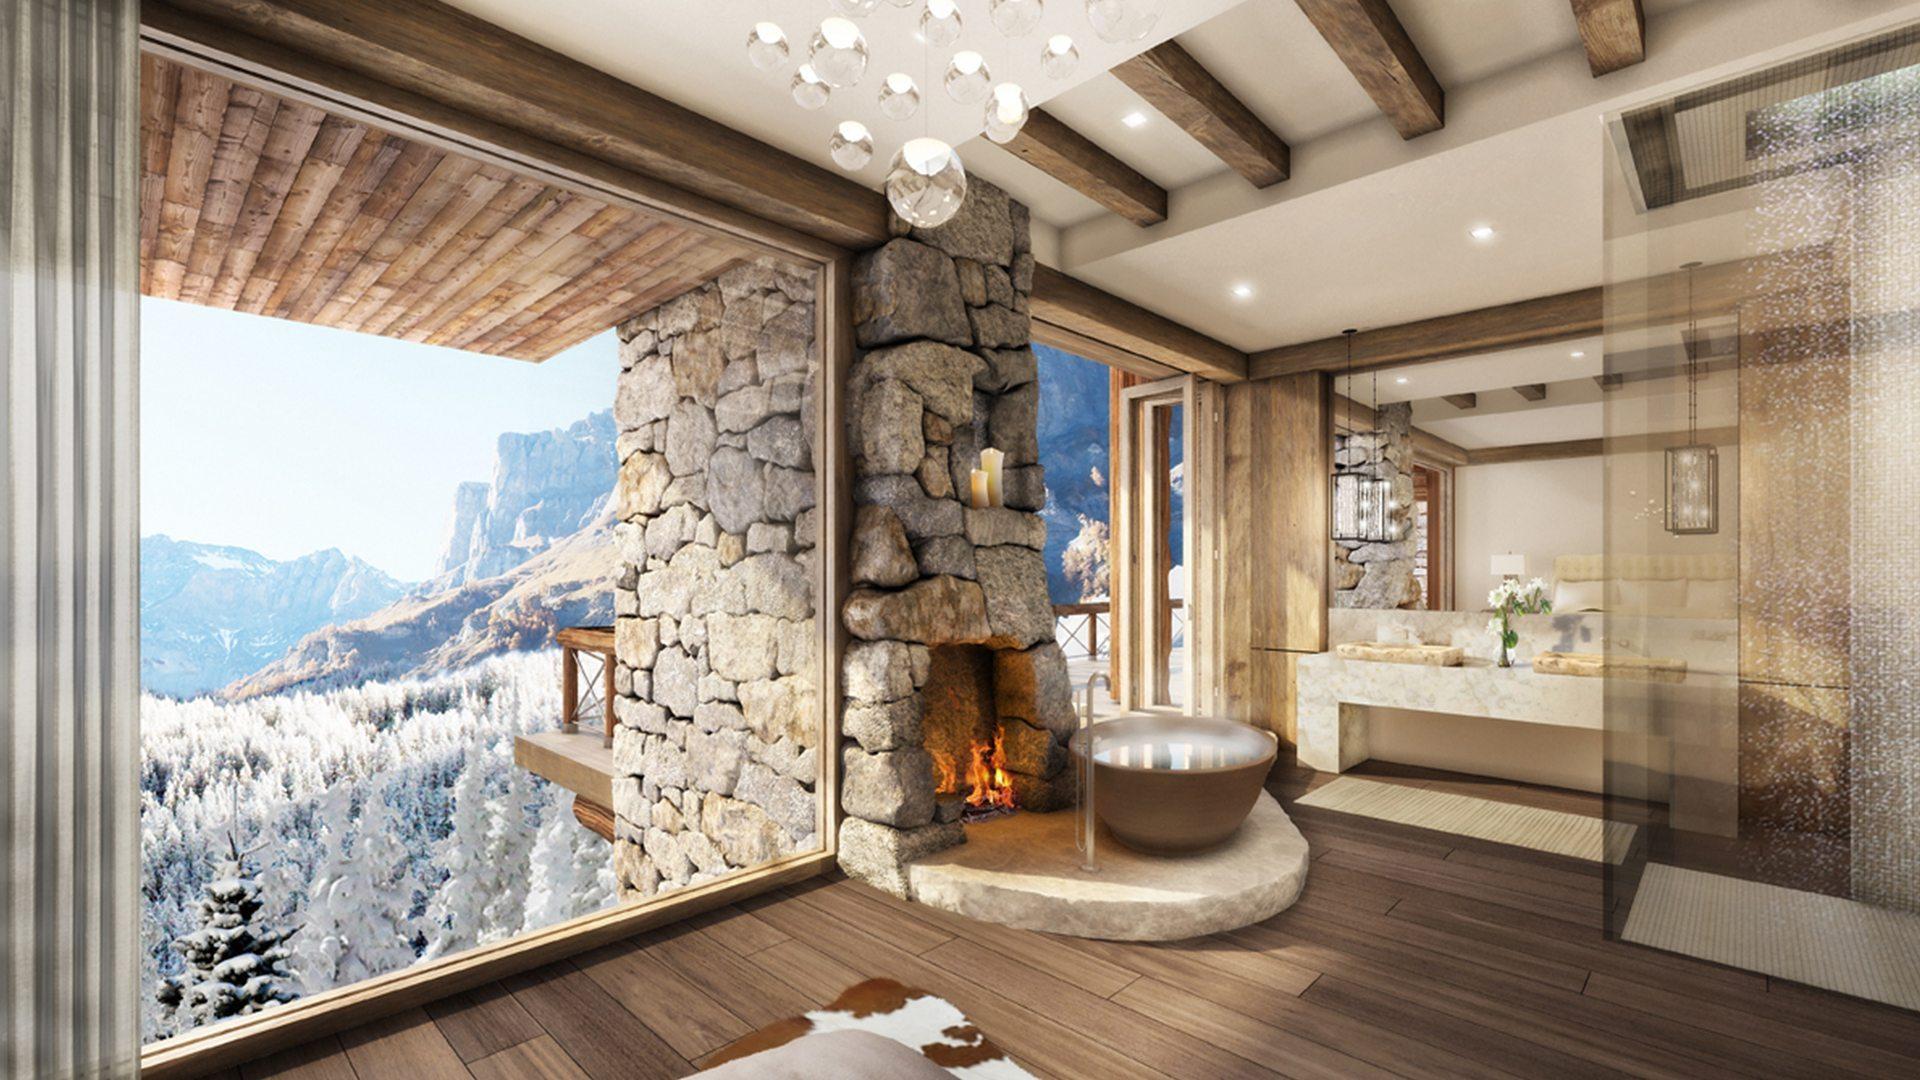 Marc-Michaels Leukerbad Switzerland Design Bathroom